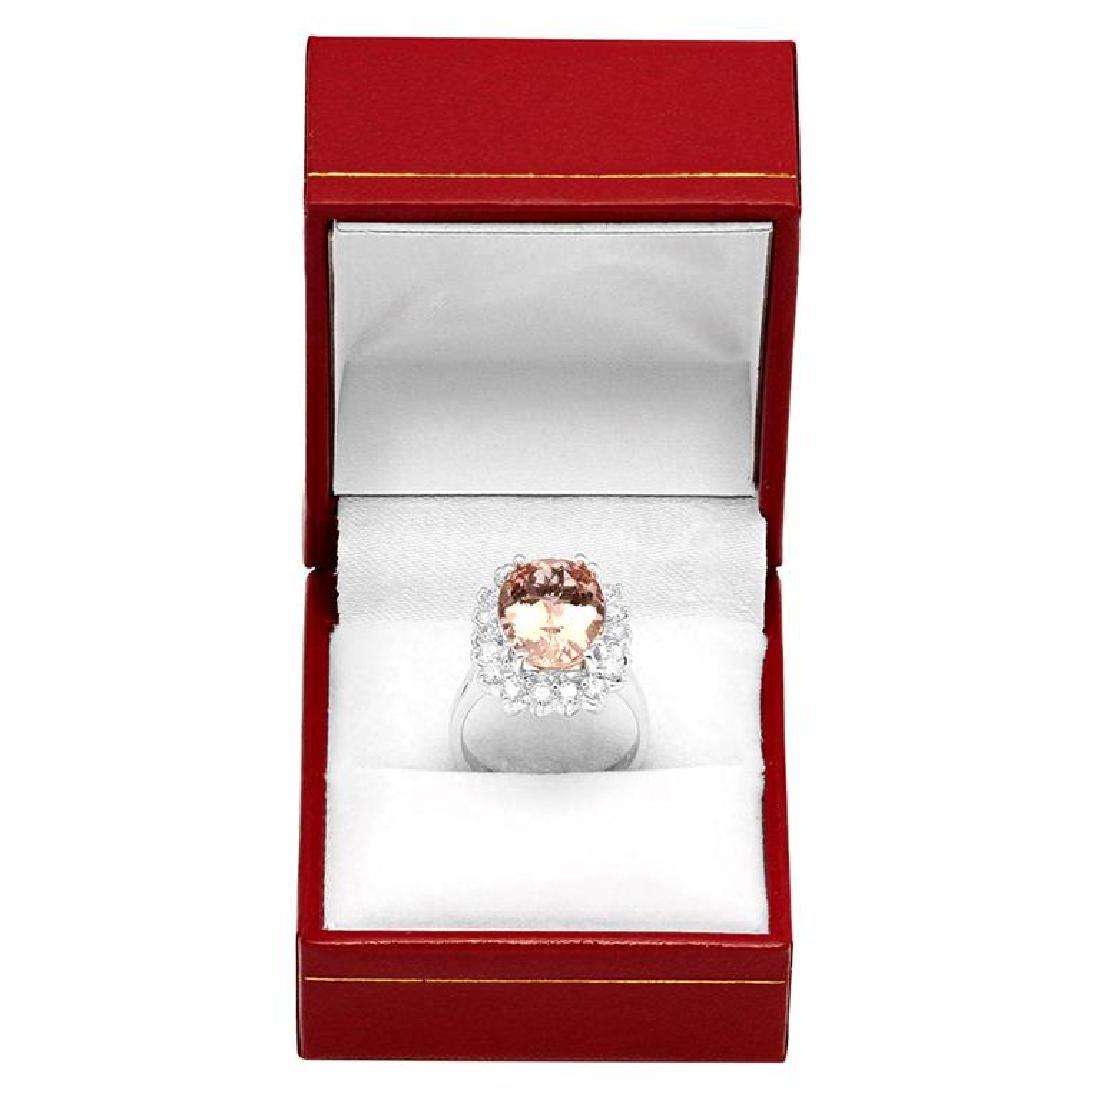 14k White Gold 6.38ct Morganite 1.19ct Diamond Ring - 4